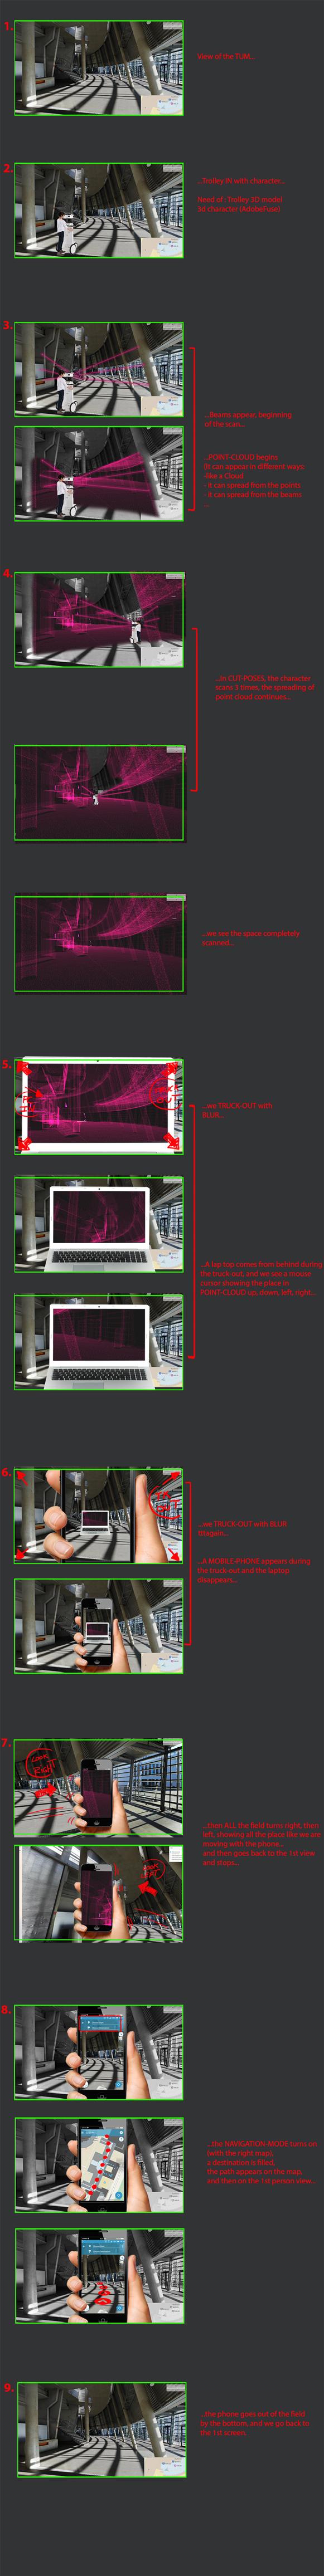 Storyboard Video Landingpage V2